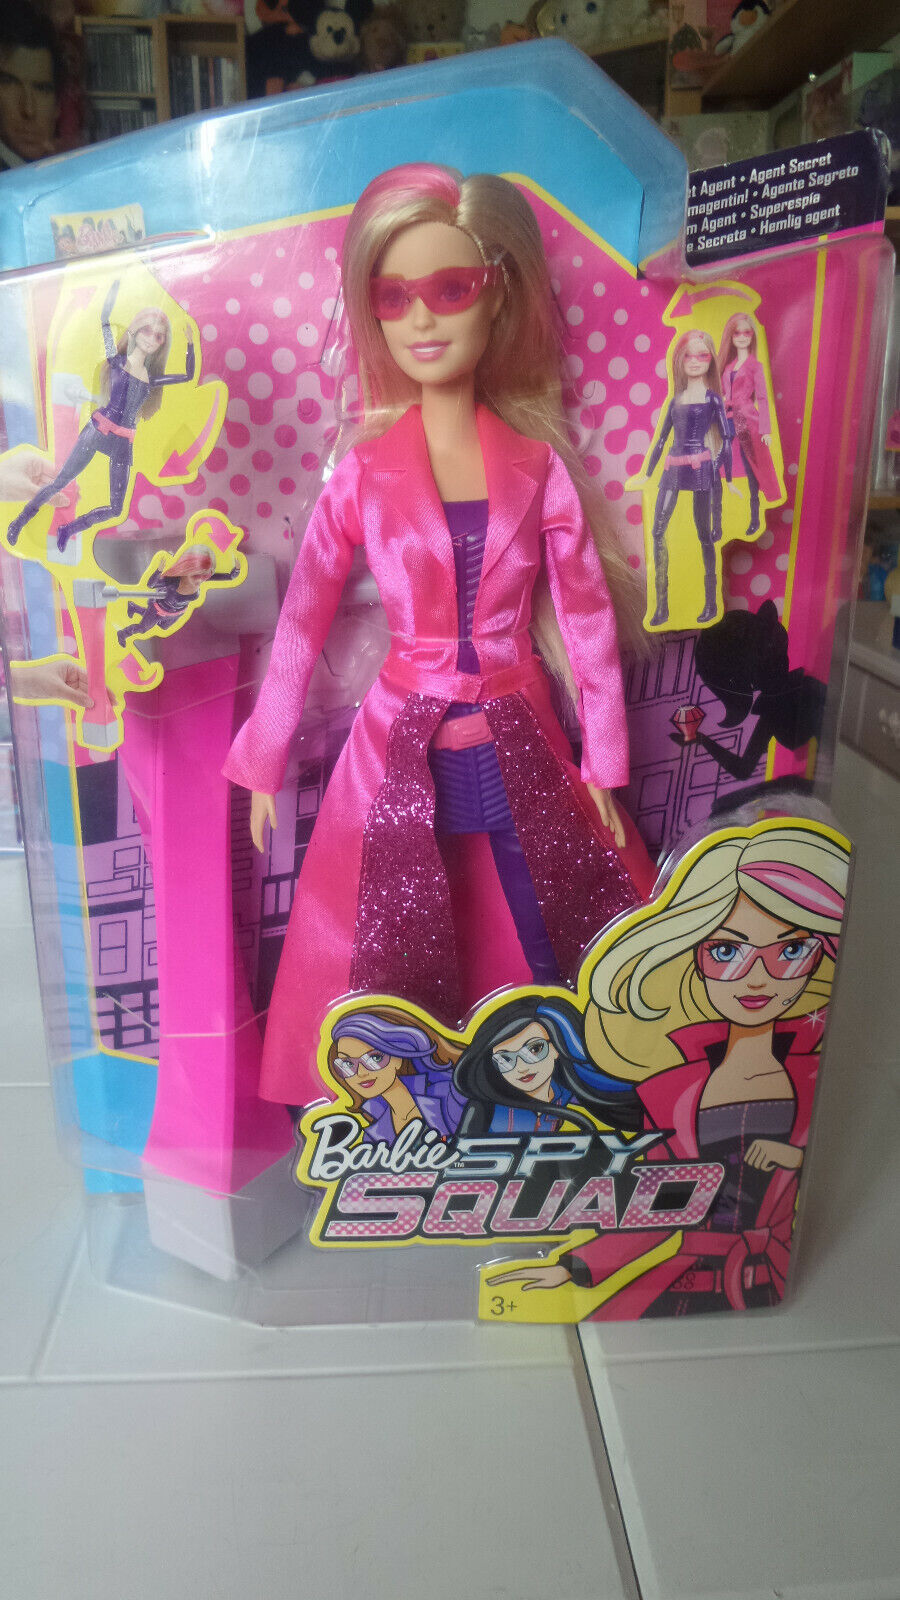 887961210262 Barbie in das Agenten Agenten Agenten Team Mattel DHF17 Puppe OVP 2015 989632